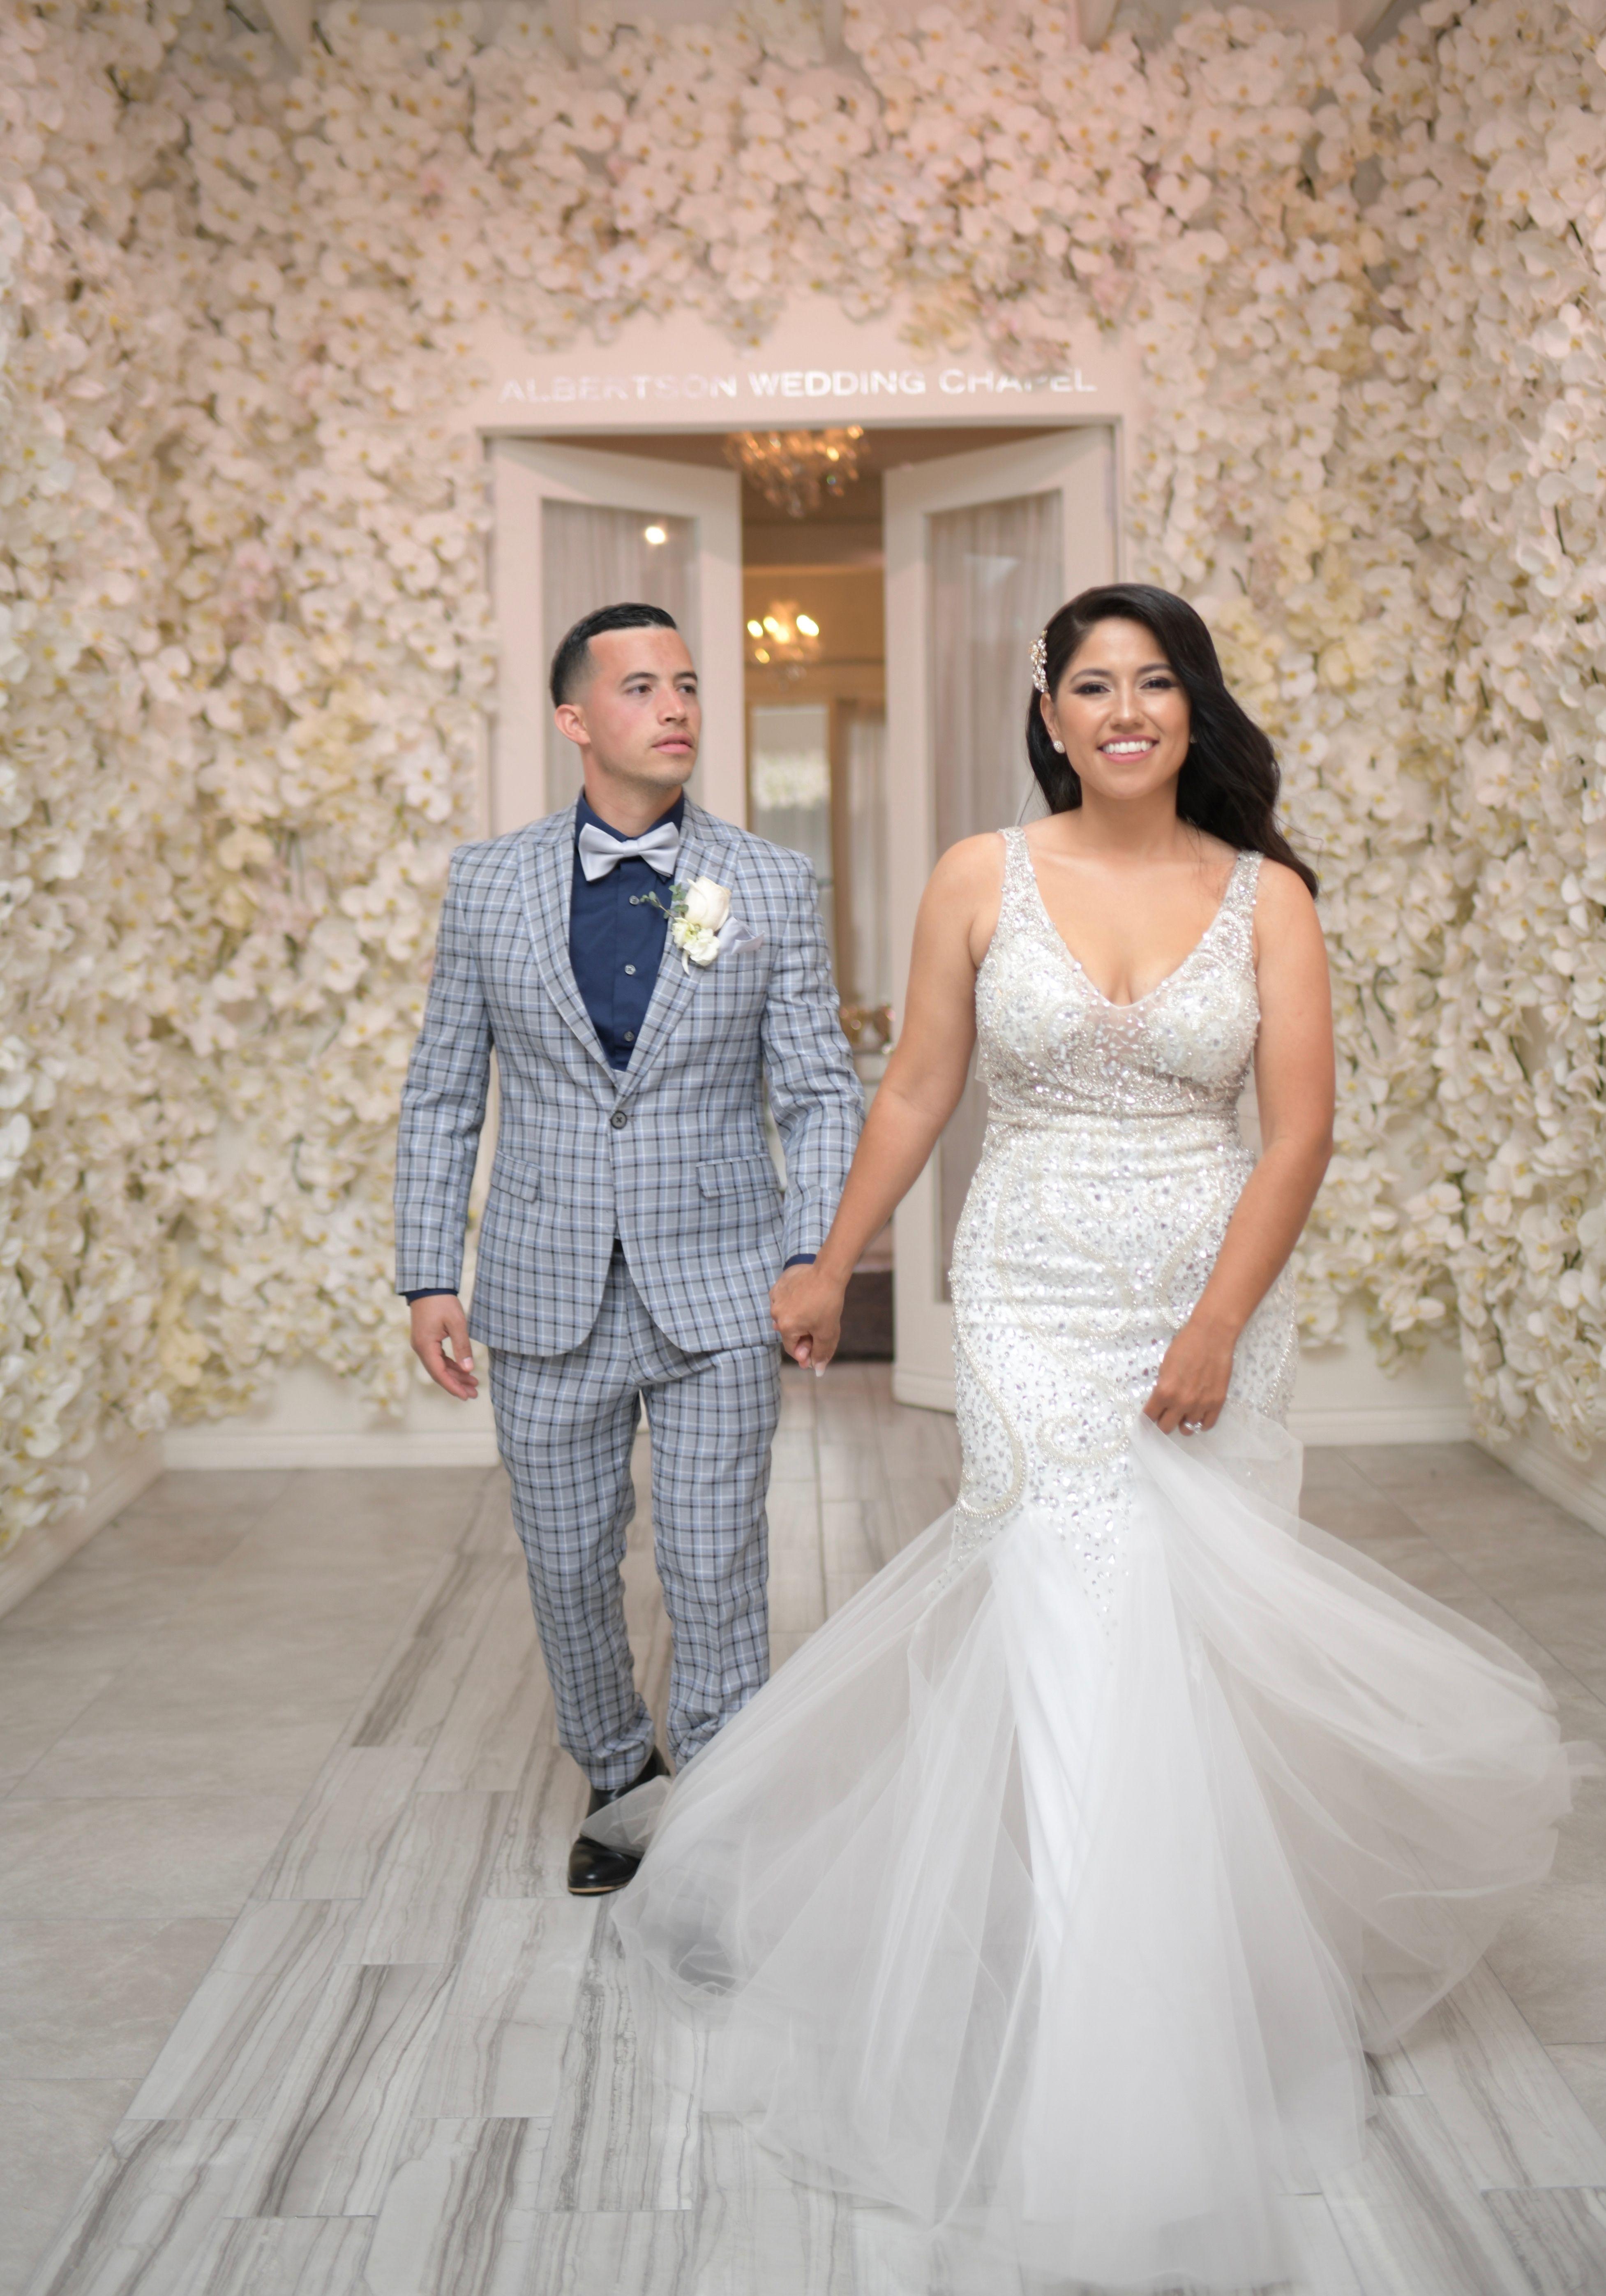 Albertson Wedding Chapel In Los Angeles Chapel Wedding Wedding Intimate Weddings